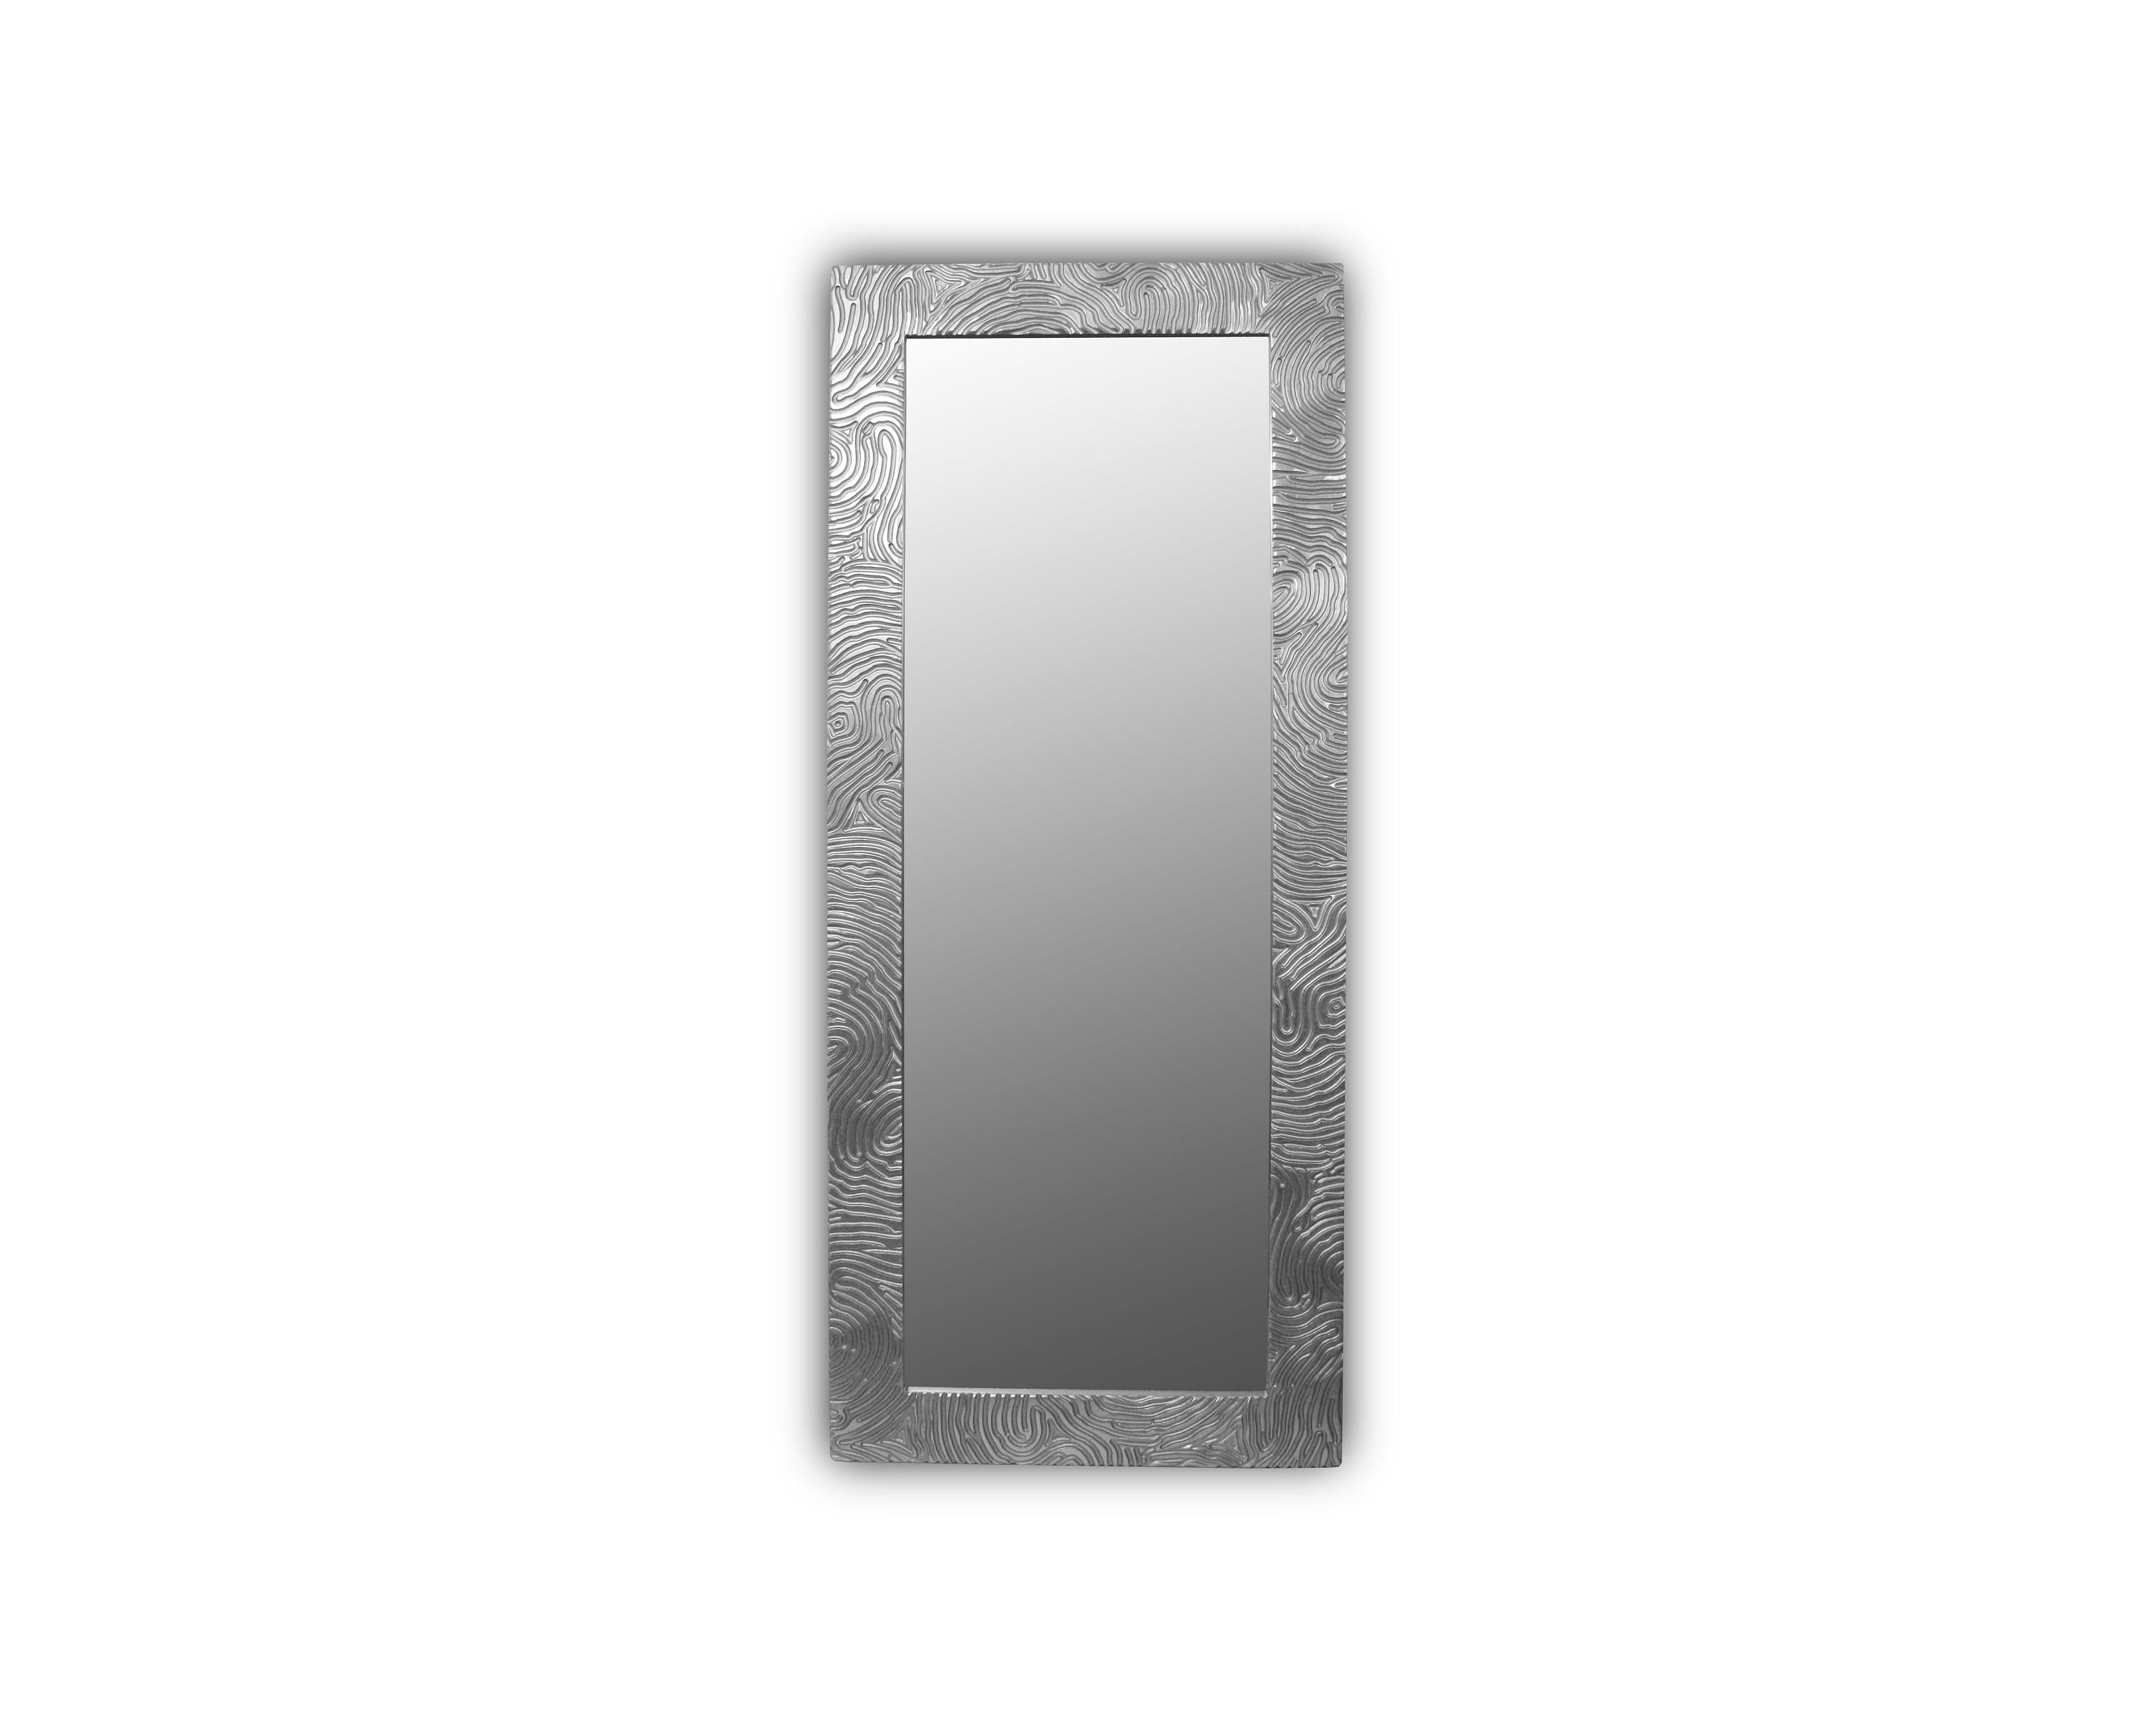 Зеркало Fashion markНастенные зеркала<br><br><br>Material: Дерево<br>Ширина см: 75.0<br>Высота см: 180.0<br>Глубина см: 3